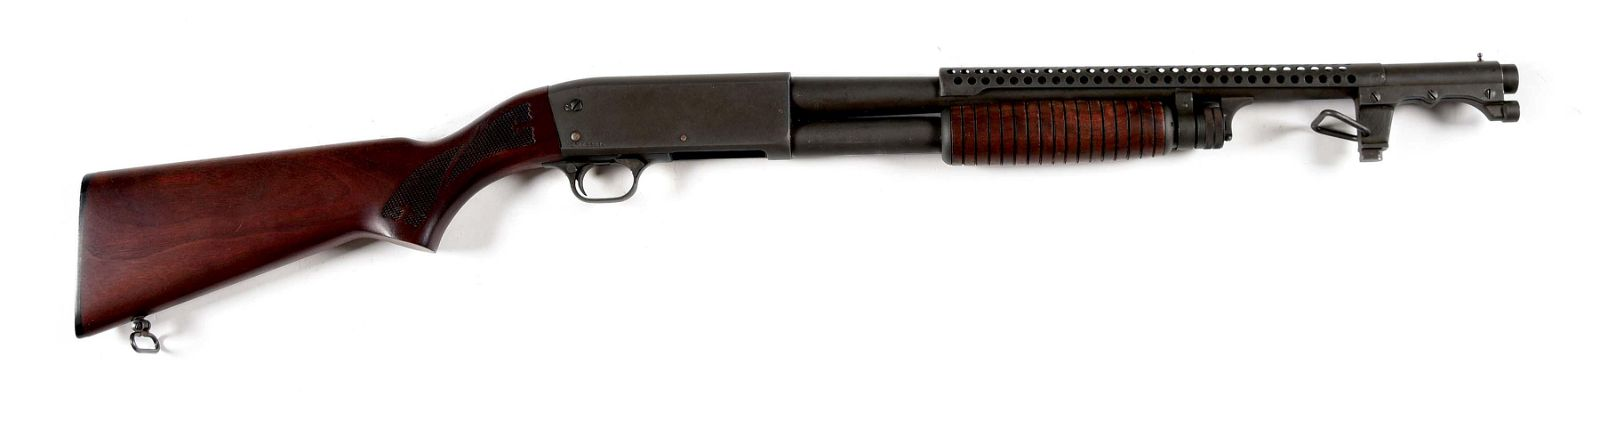 Model 37 shotgun ithaca Ithaca Pricing